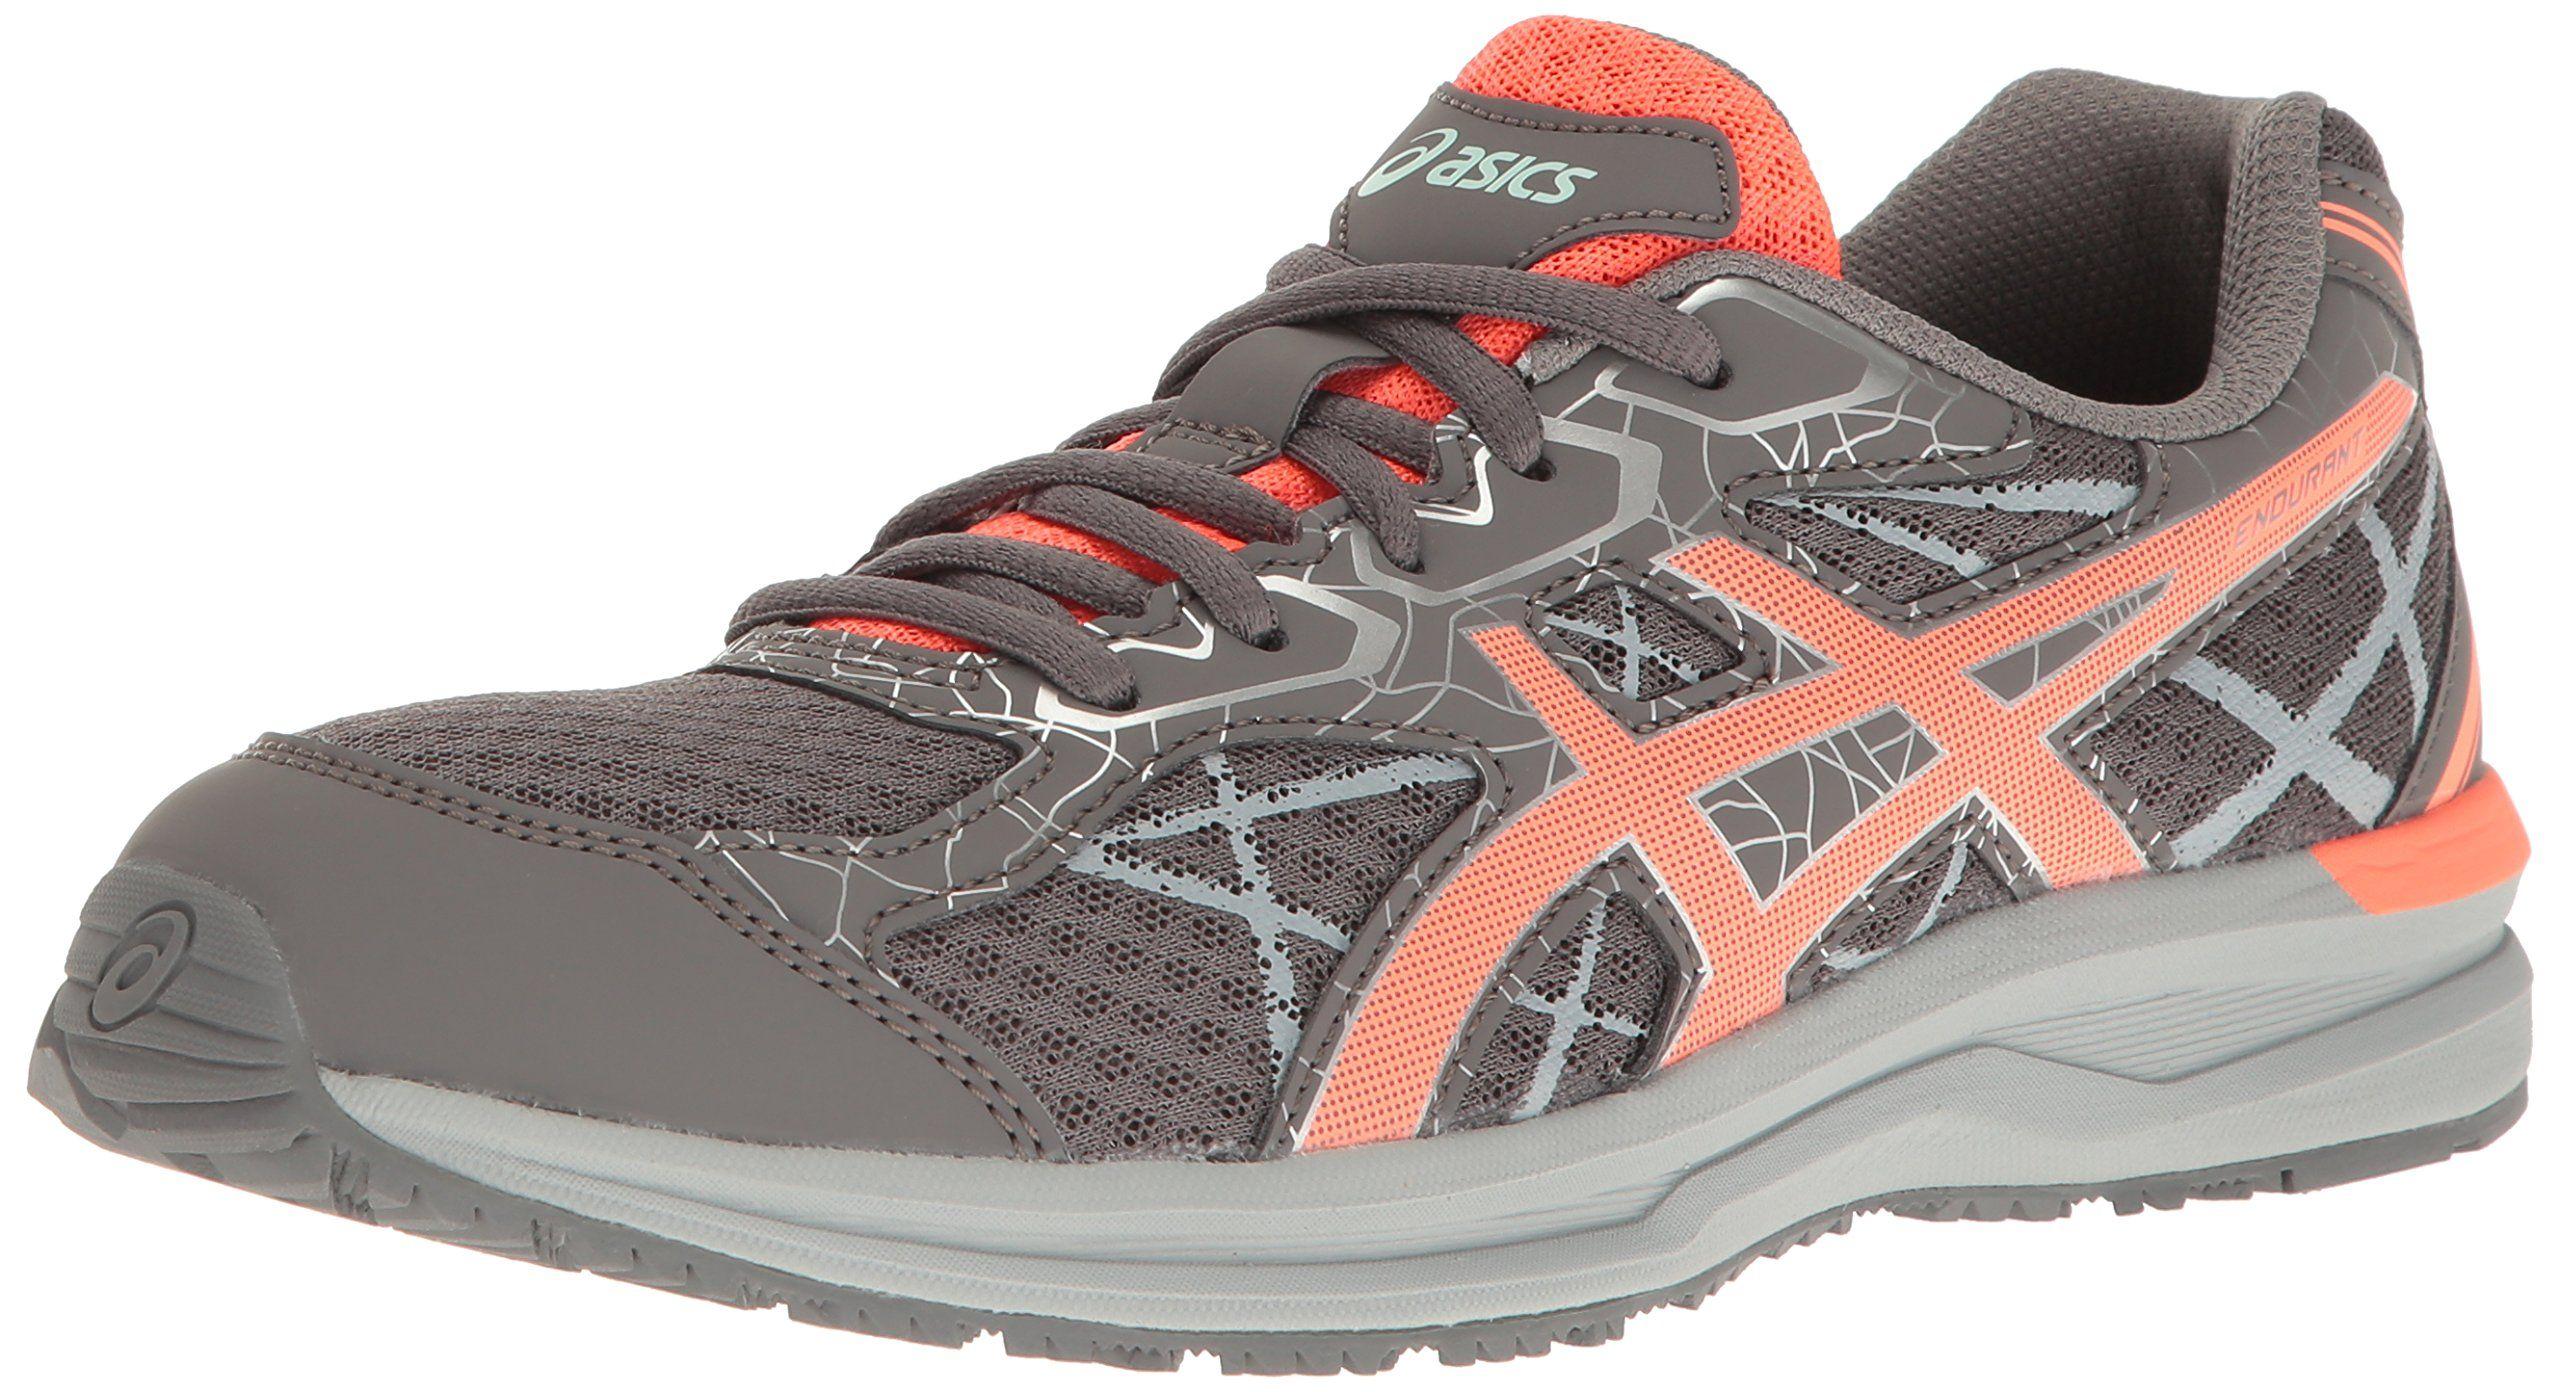 ASICS Chaussure de running , 12 Endurant Carbone pour Femme , Carbone/ Flash Coral/ Argent , 12 M 8a9a176 - dhsocialbookmrking.website